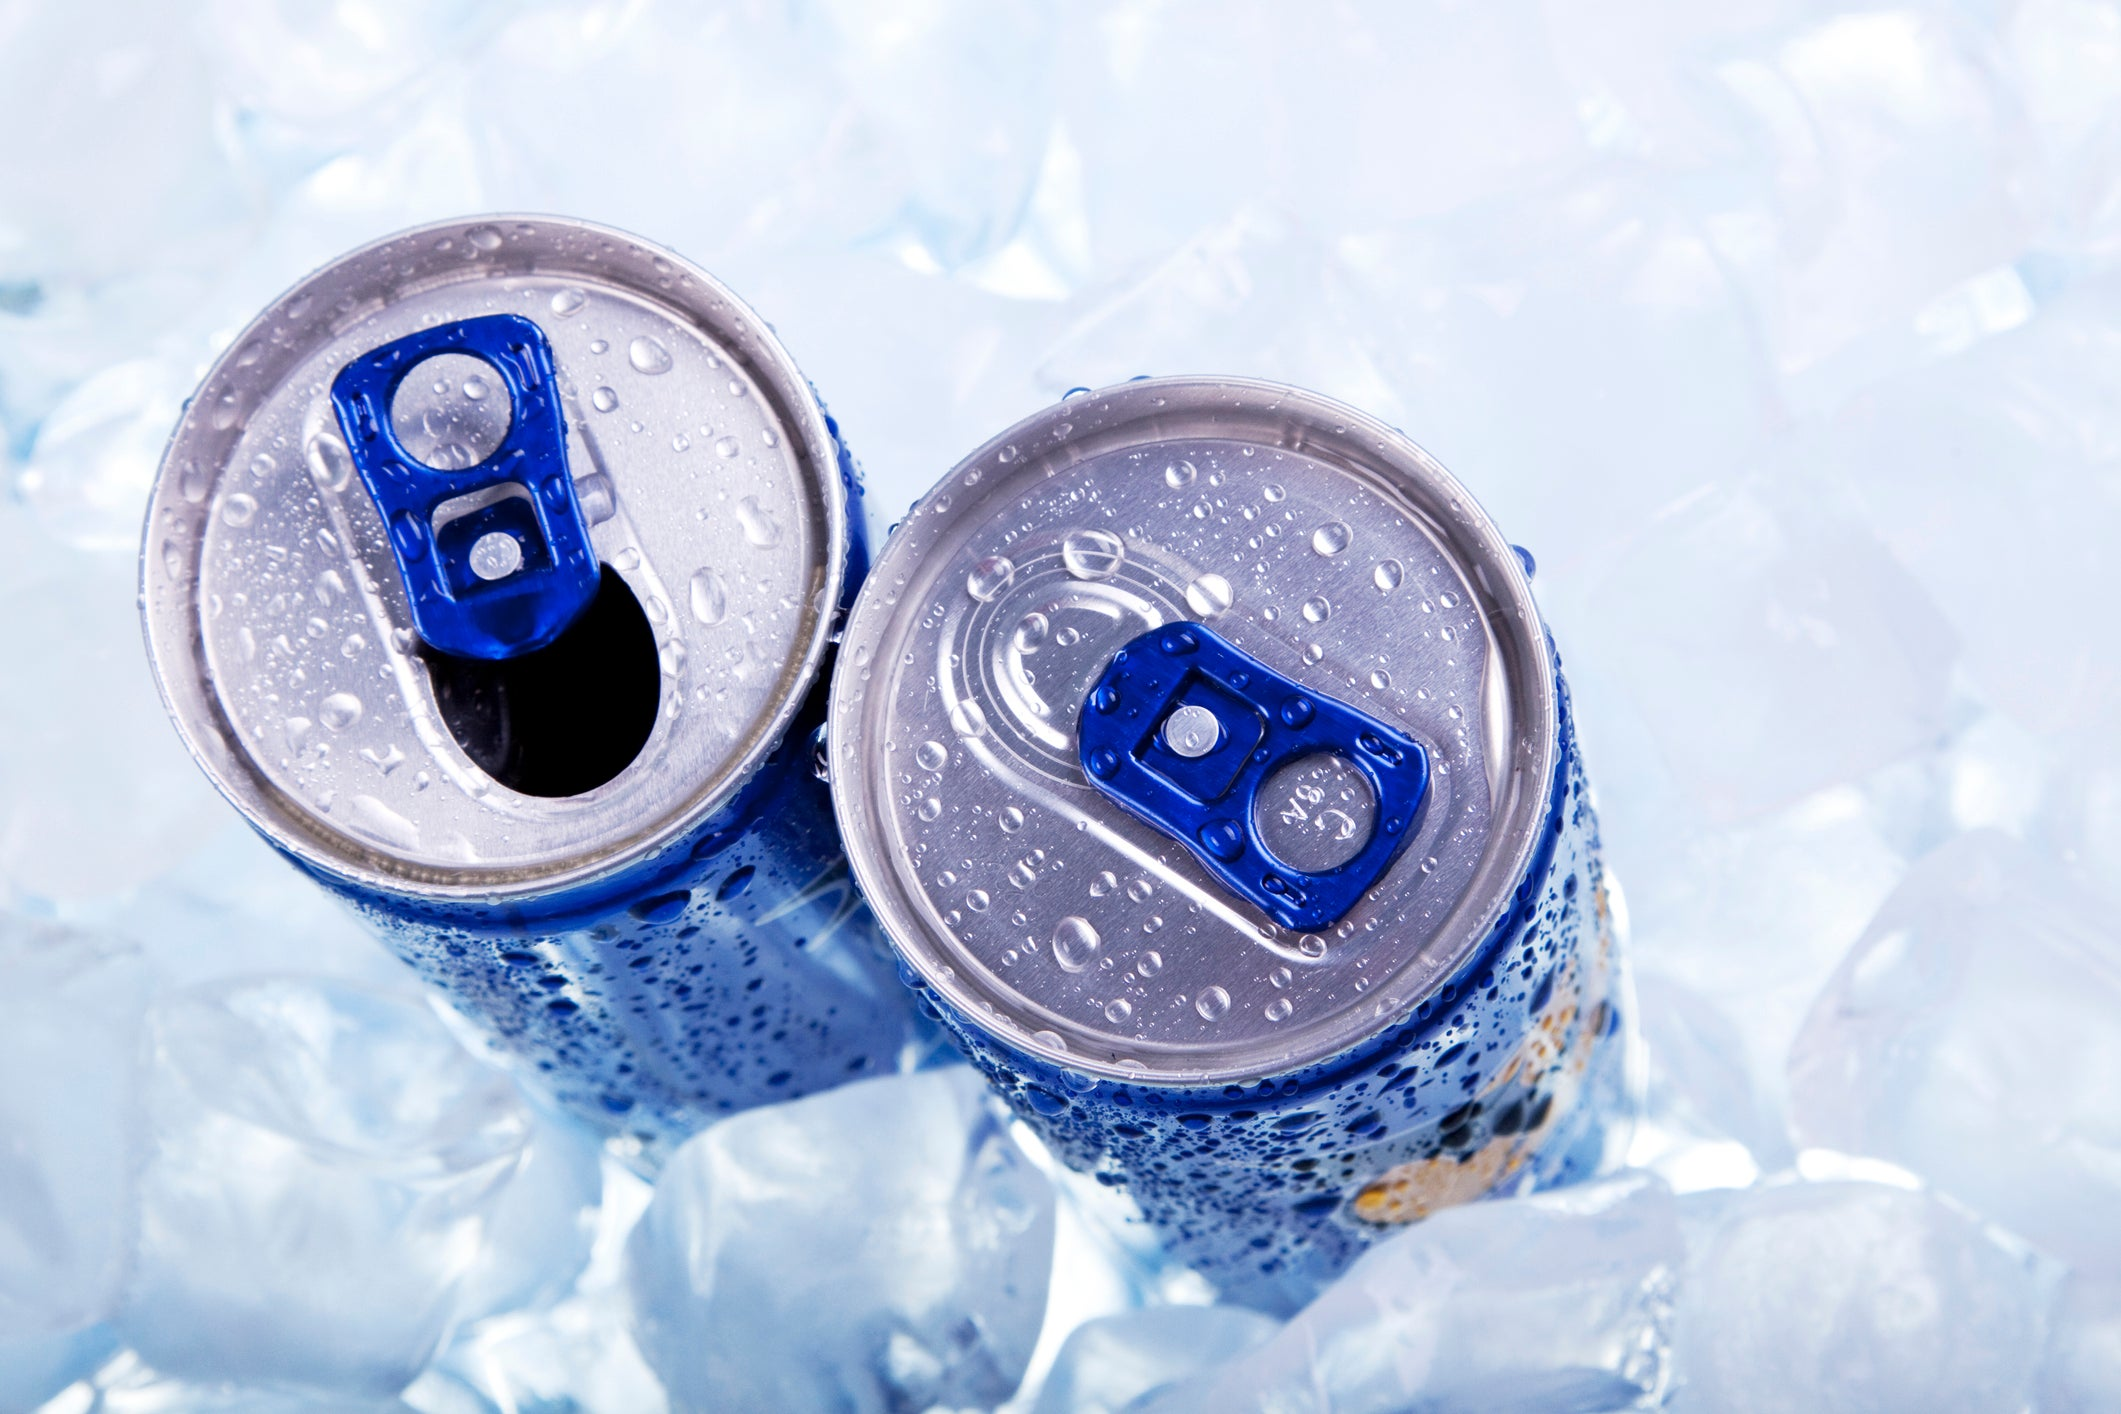 Regulators Clear The Way For Pepsi's Rockstar Purchase @themotleyfool #stocks $pep photo